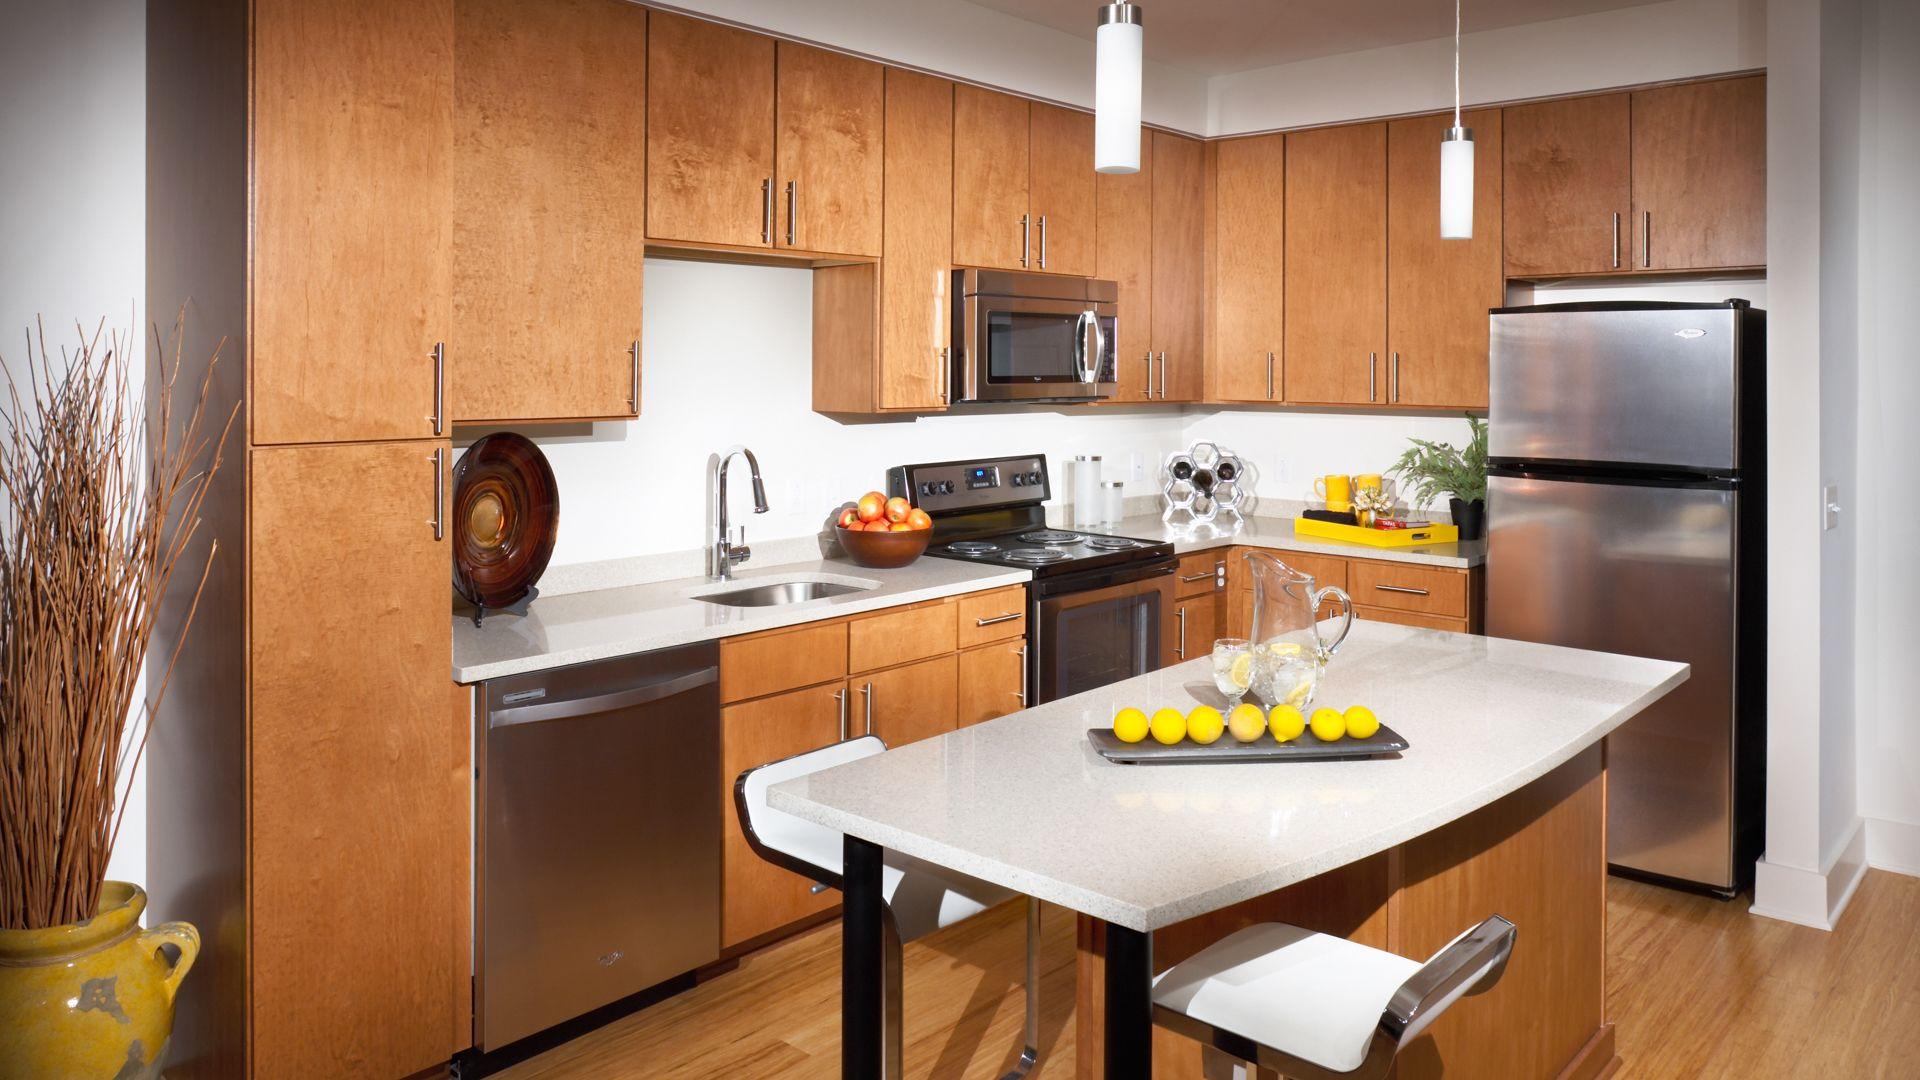 2201 Pershing Apartments Kitchen